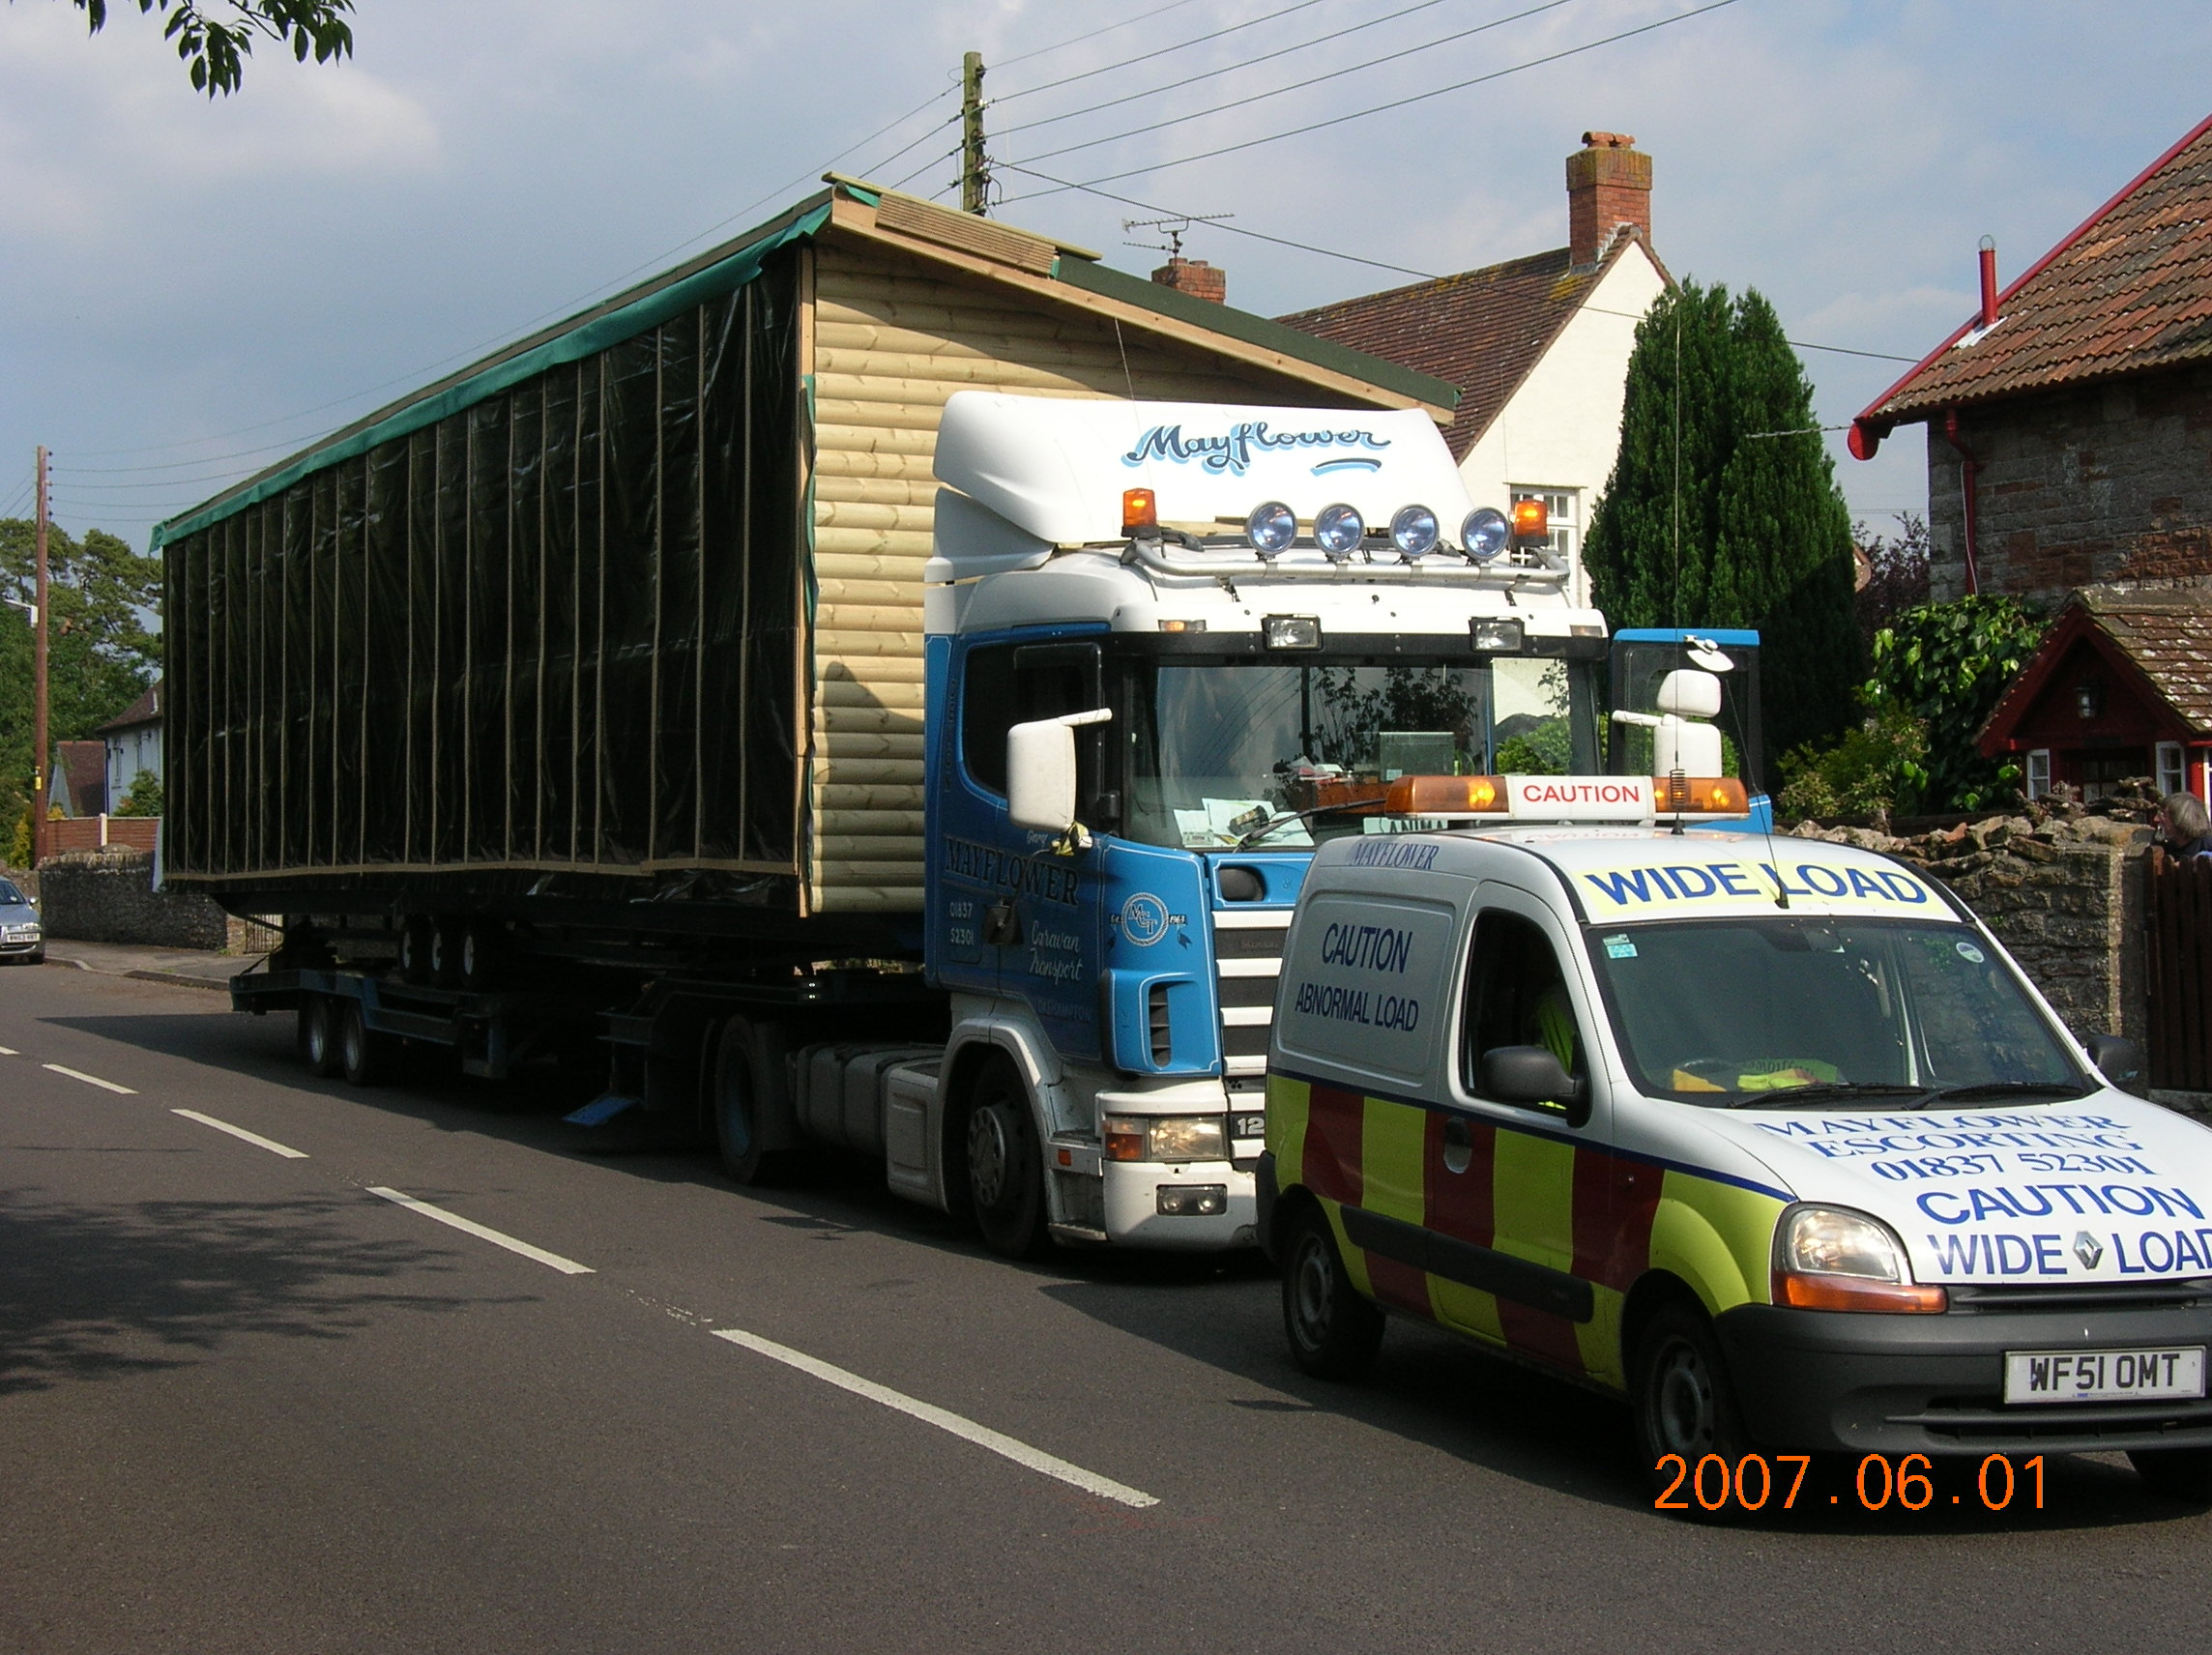 Mayflower Caravan Transport: Escort